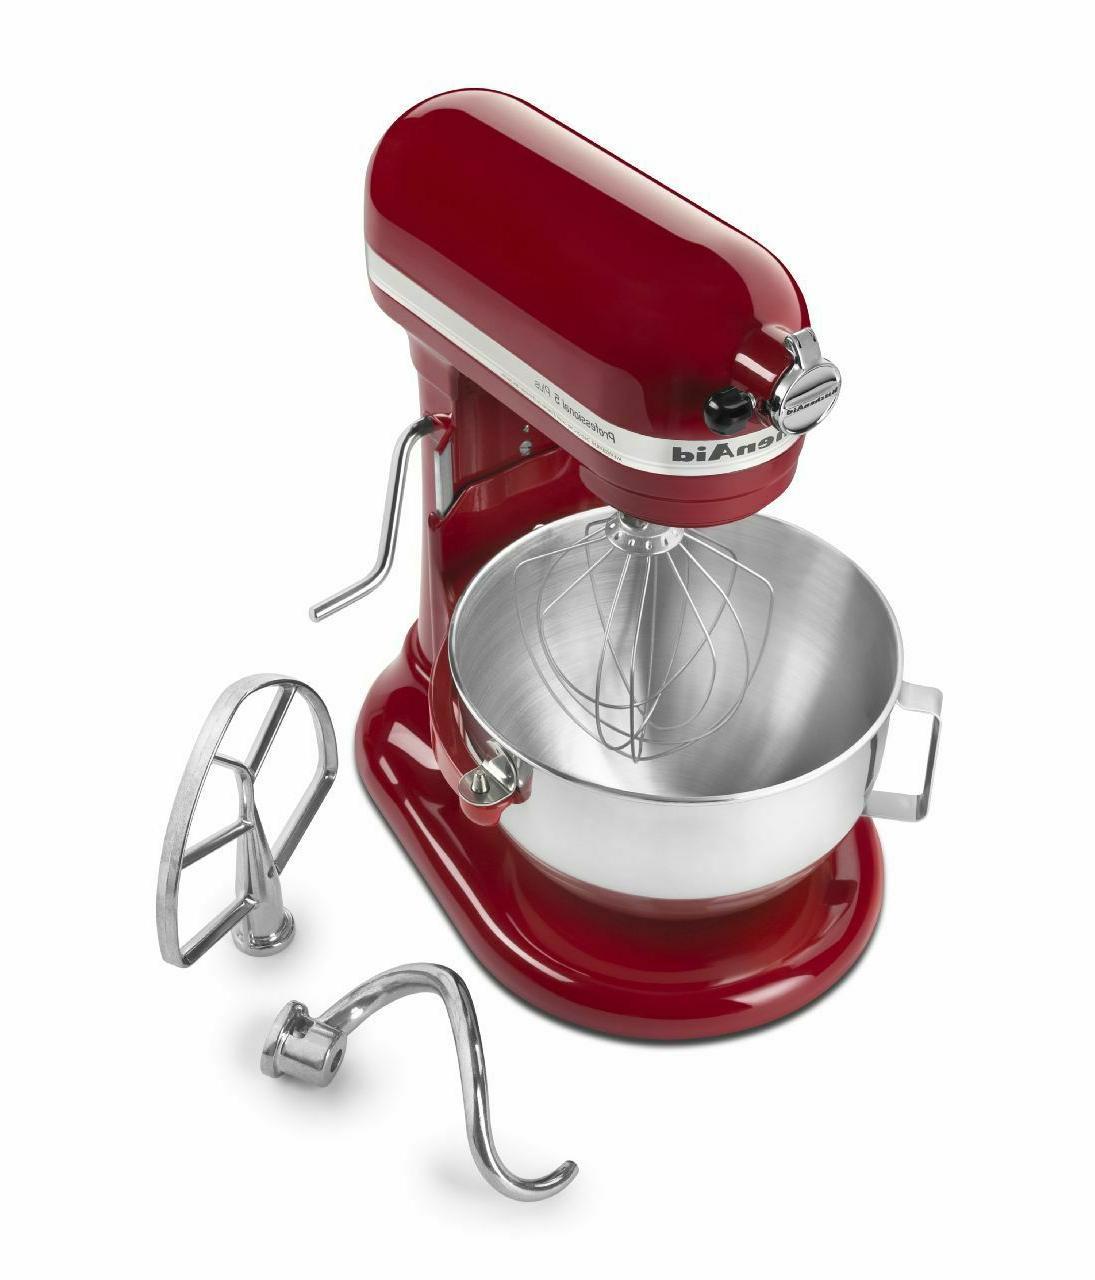 KitchenAid® Professional Plus Series 5 Quart Bowl-Lift Stand